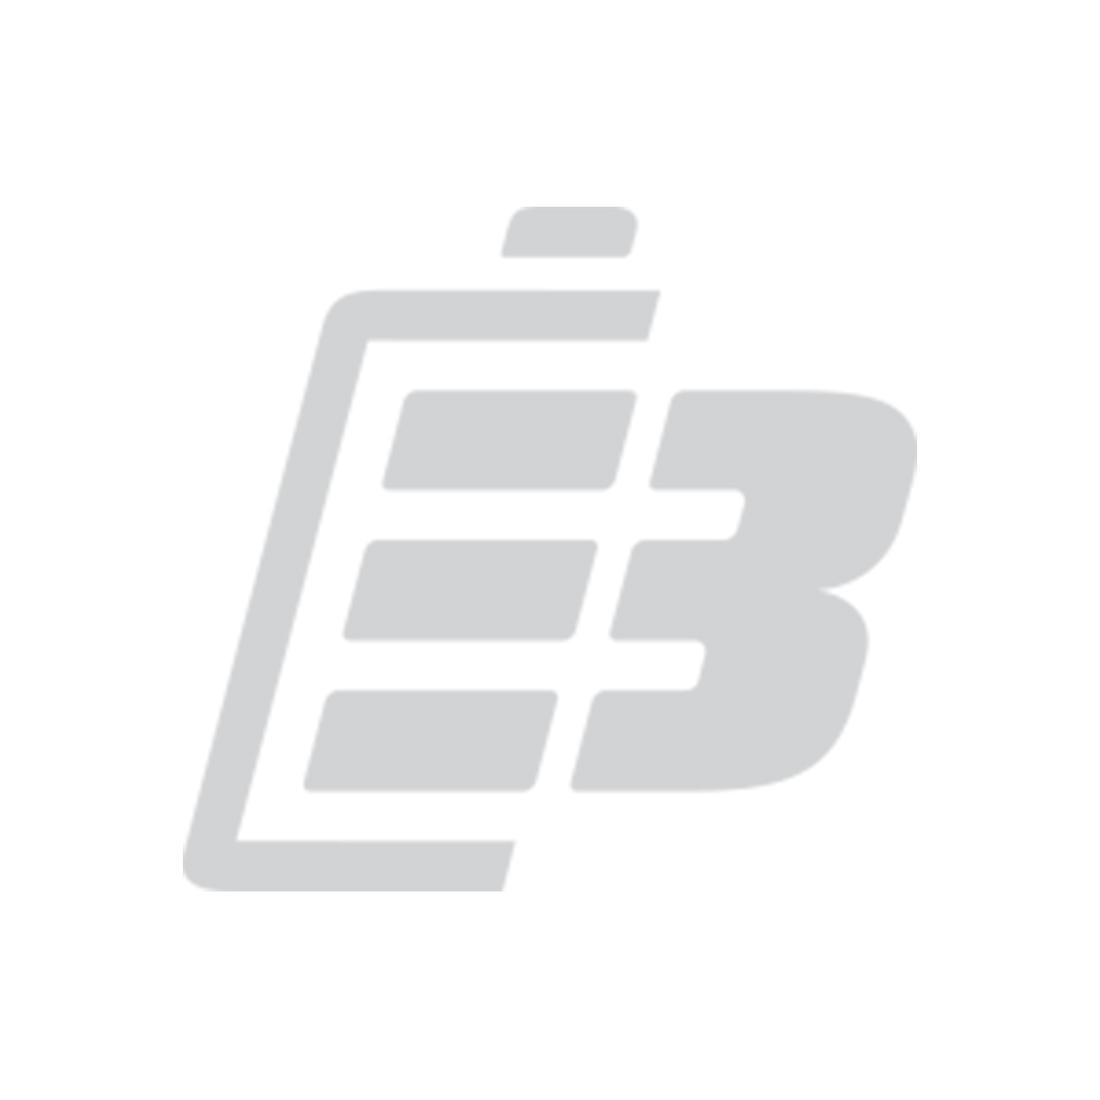 Fenix HL15 LED headlamp black 1